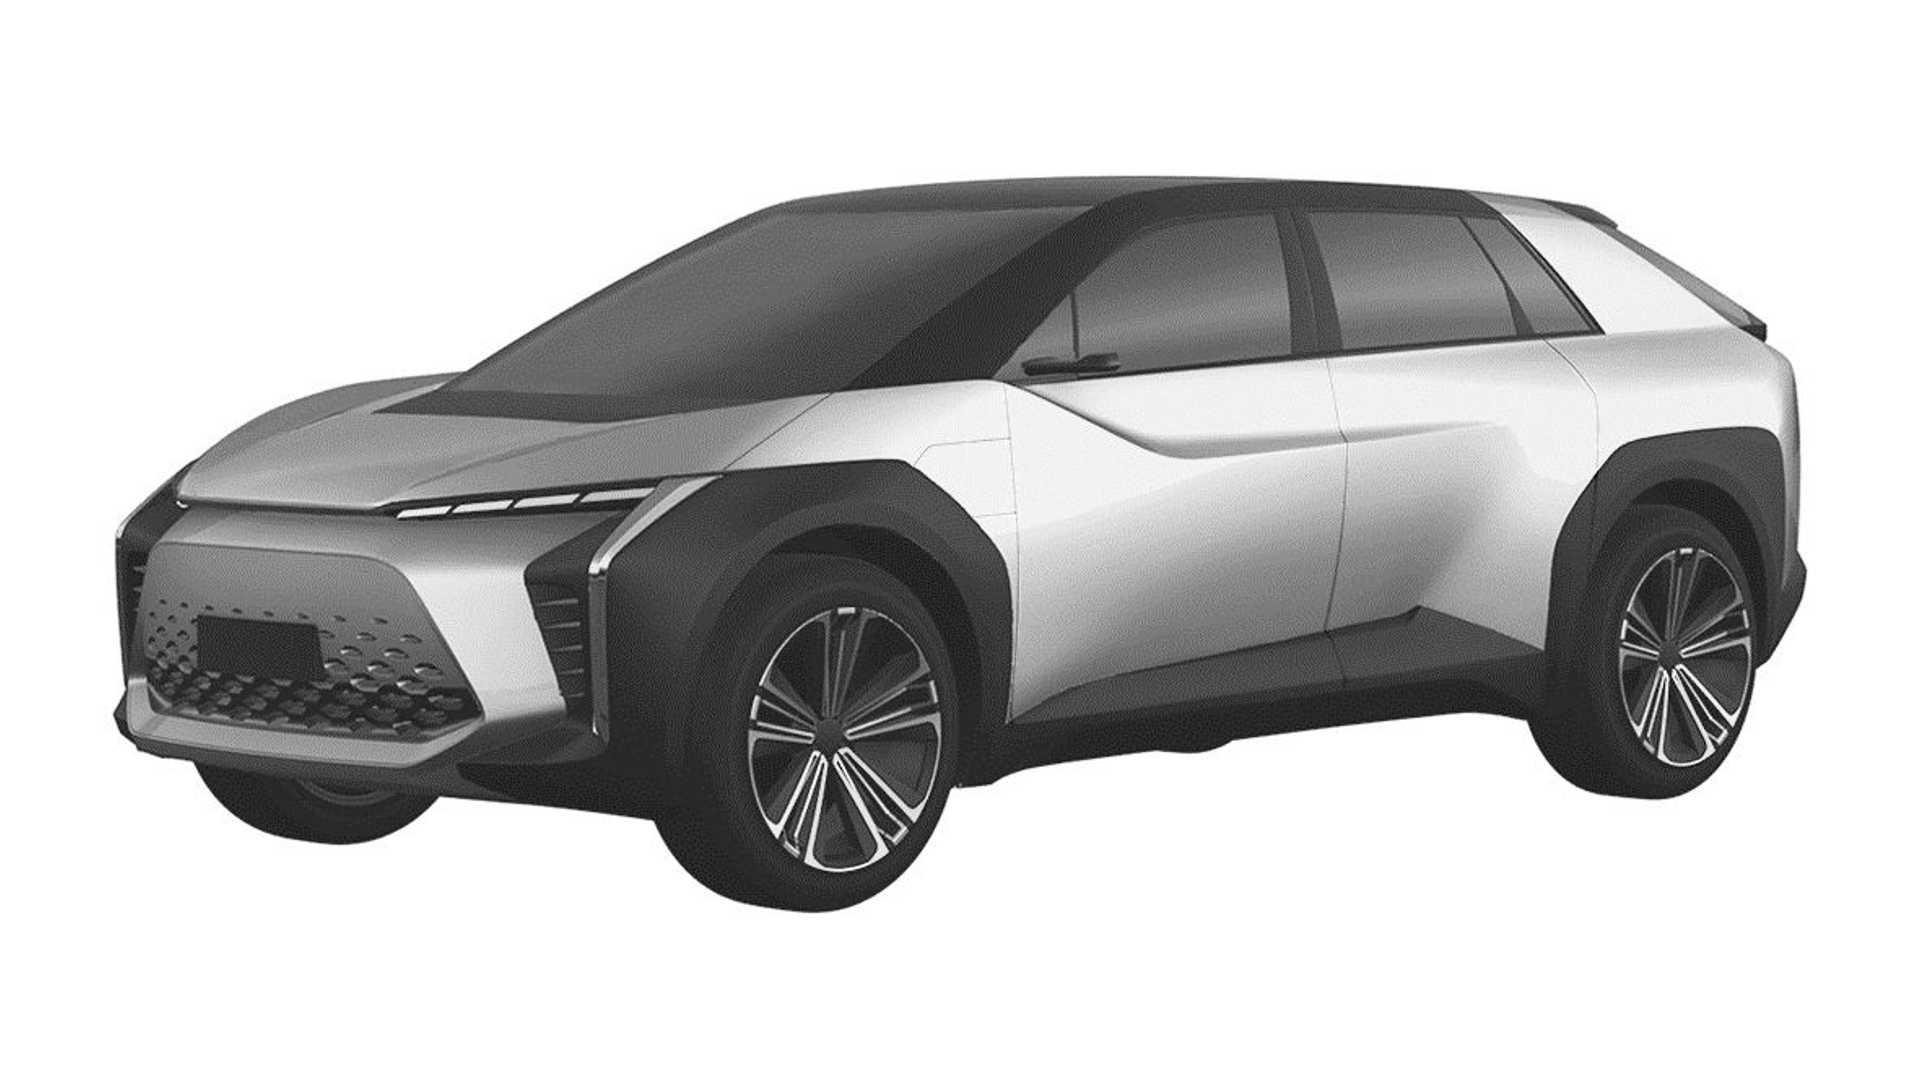 Toyota-Crossover-Design-Trademark-patents-1